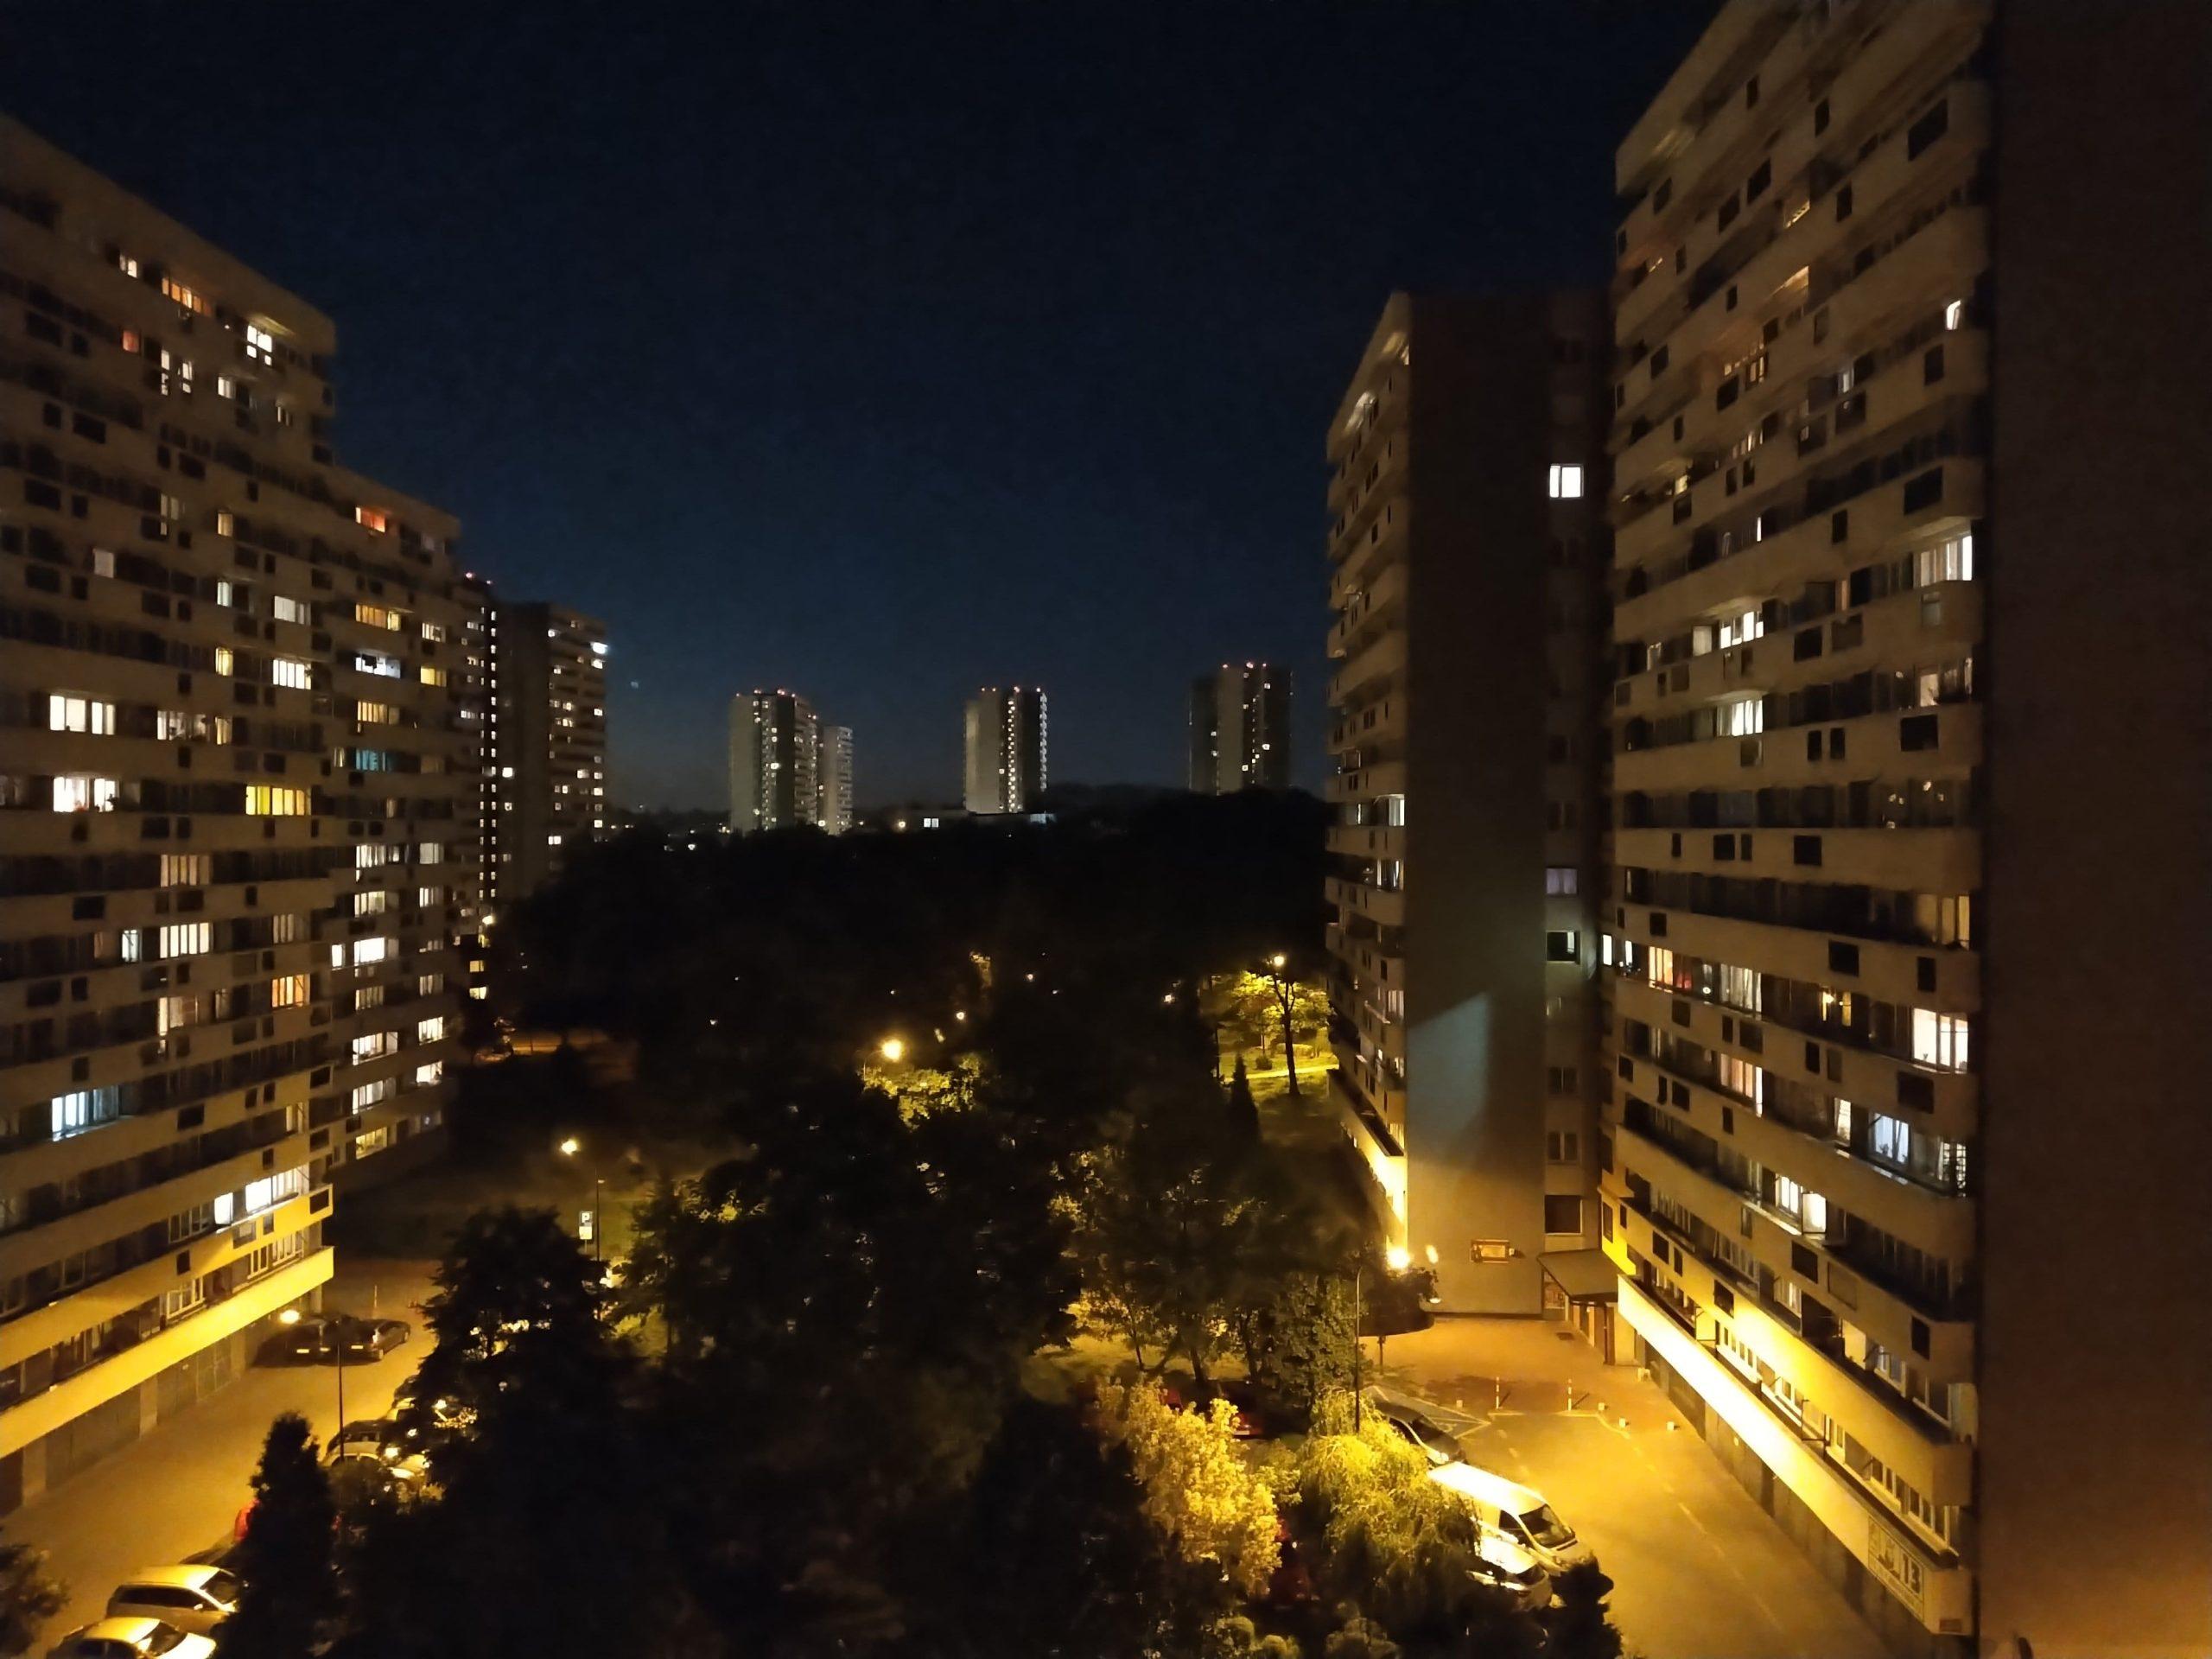 Zdjęcia nocne - HTC Desire 20 Pro